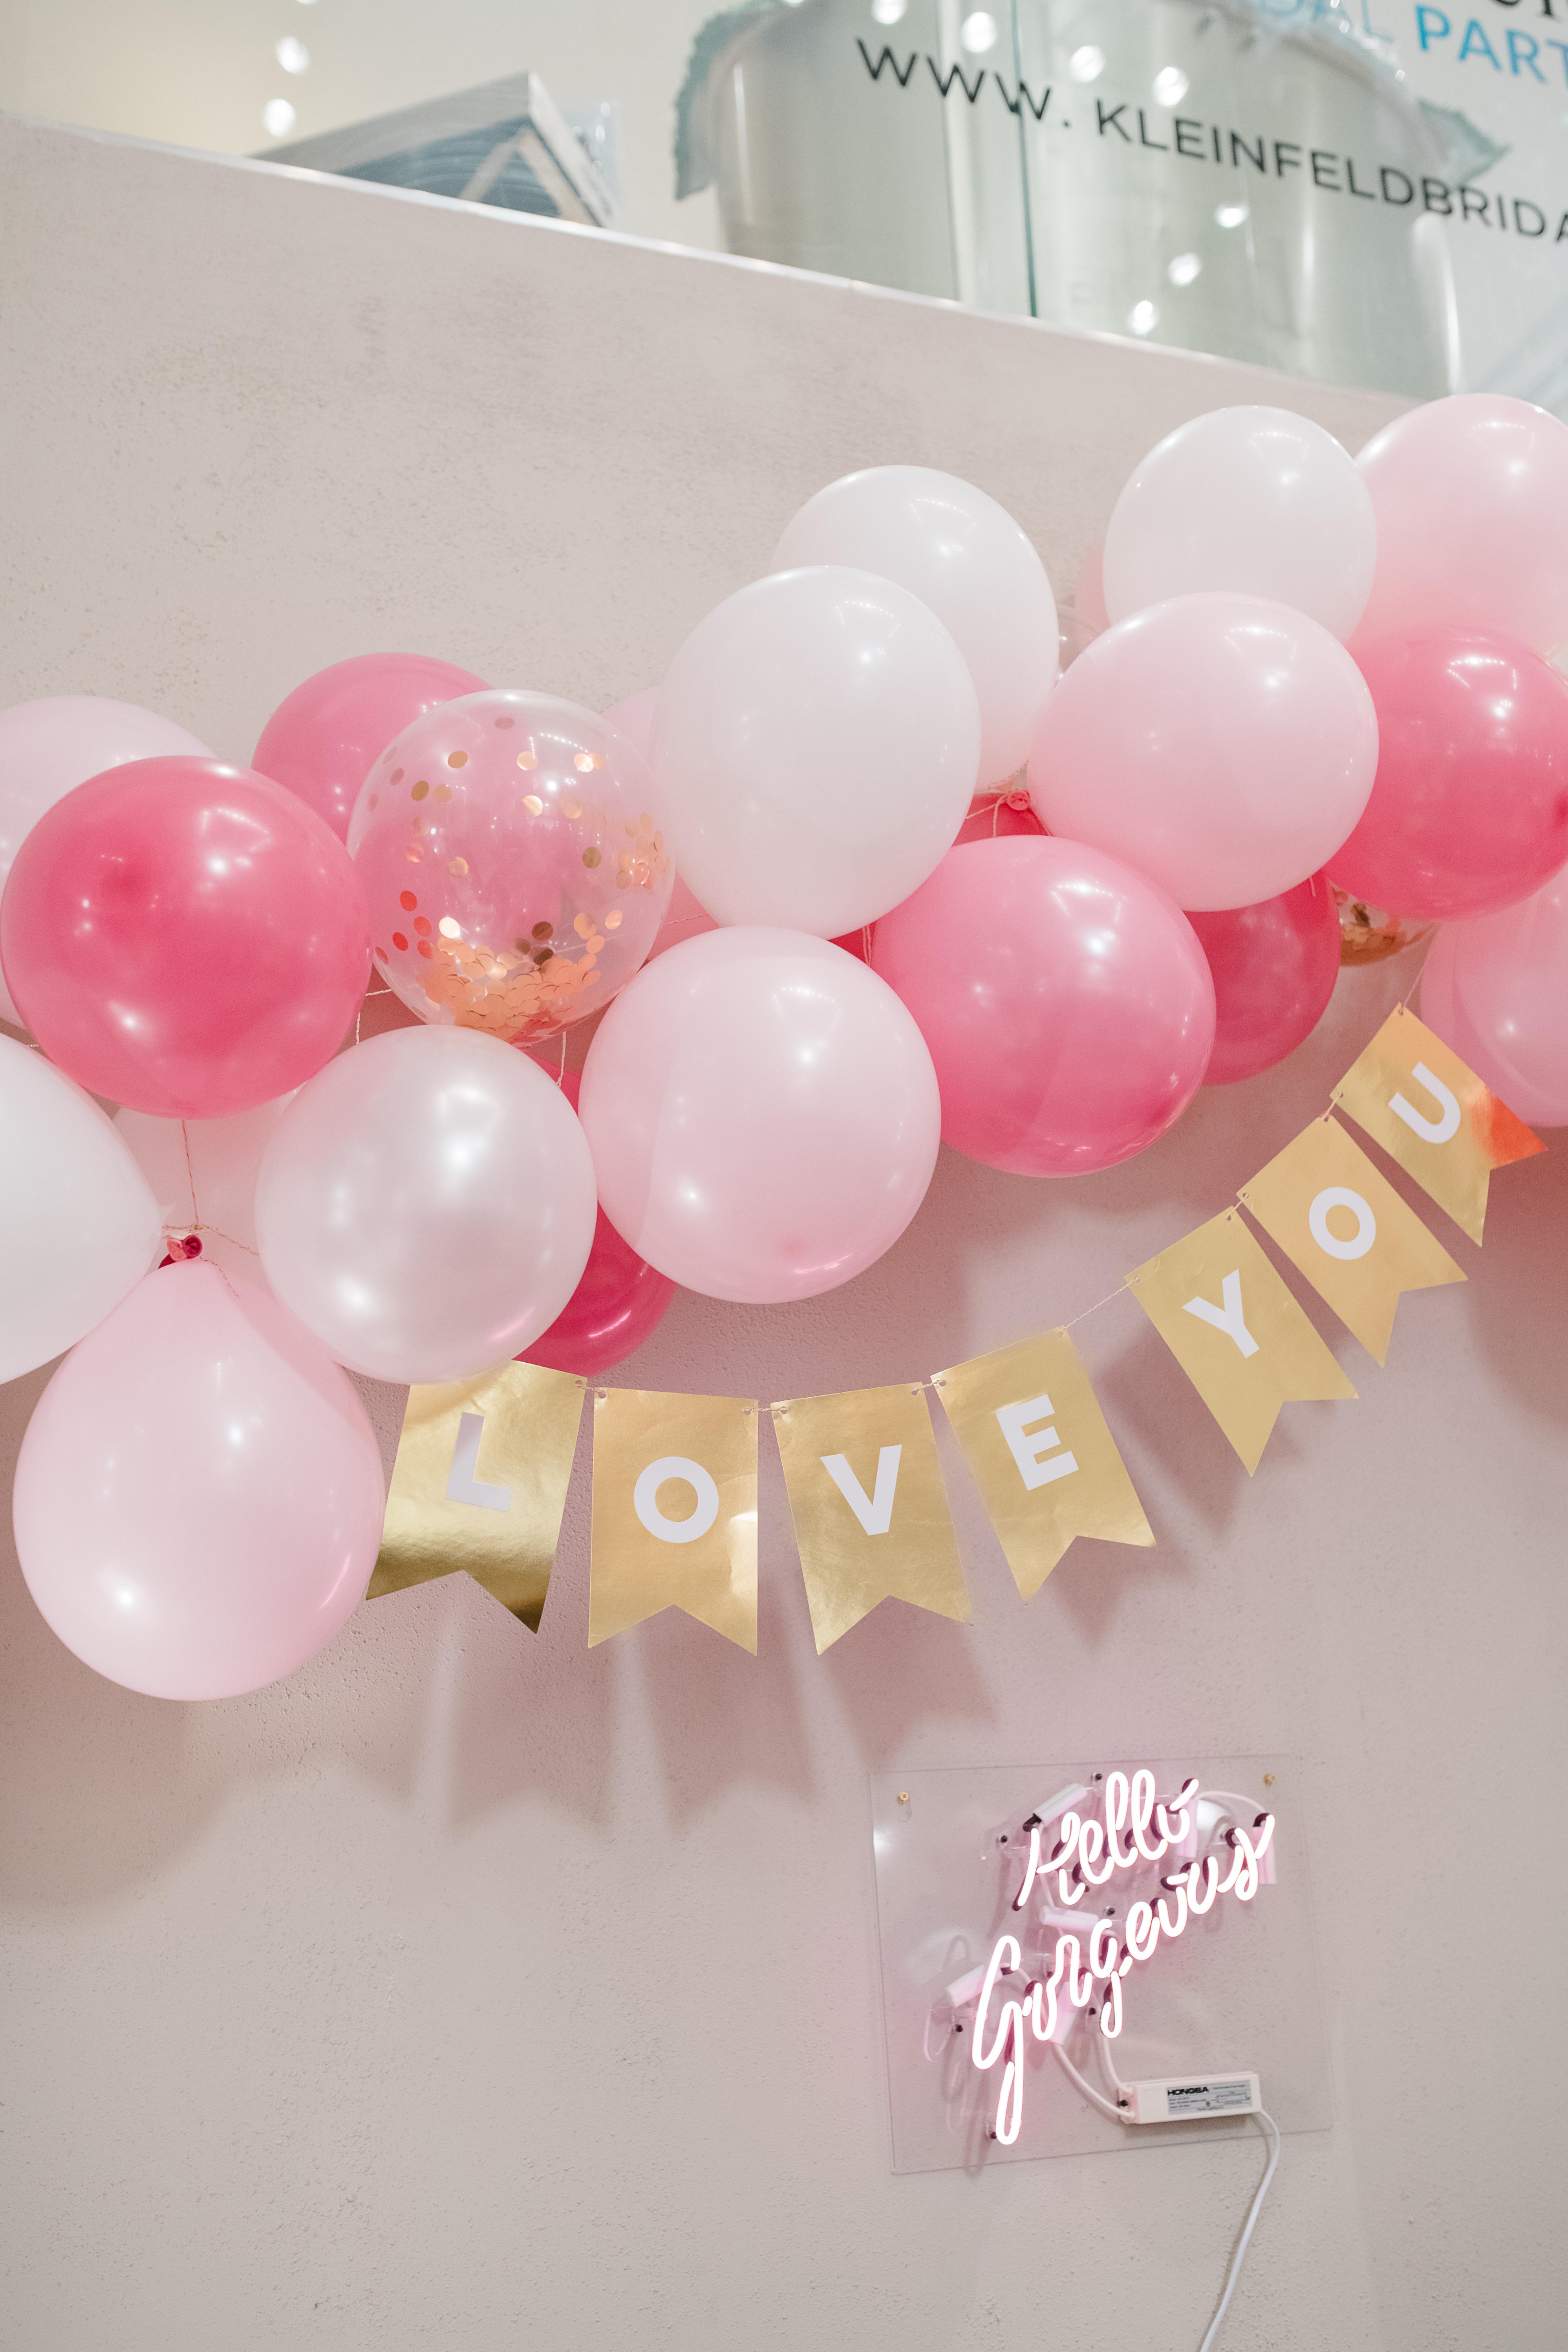 Wedding party balloon décor with neon sign